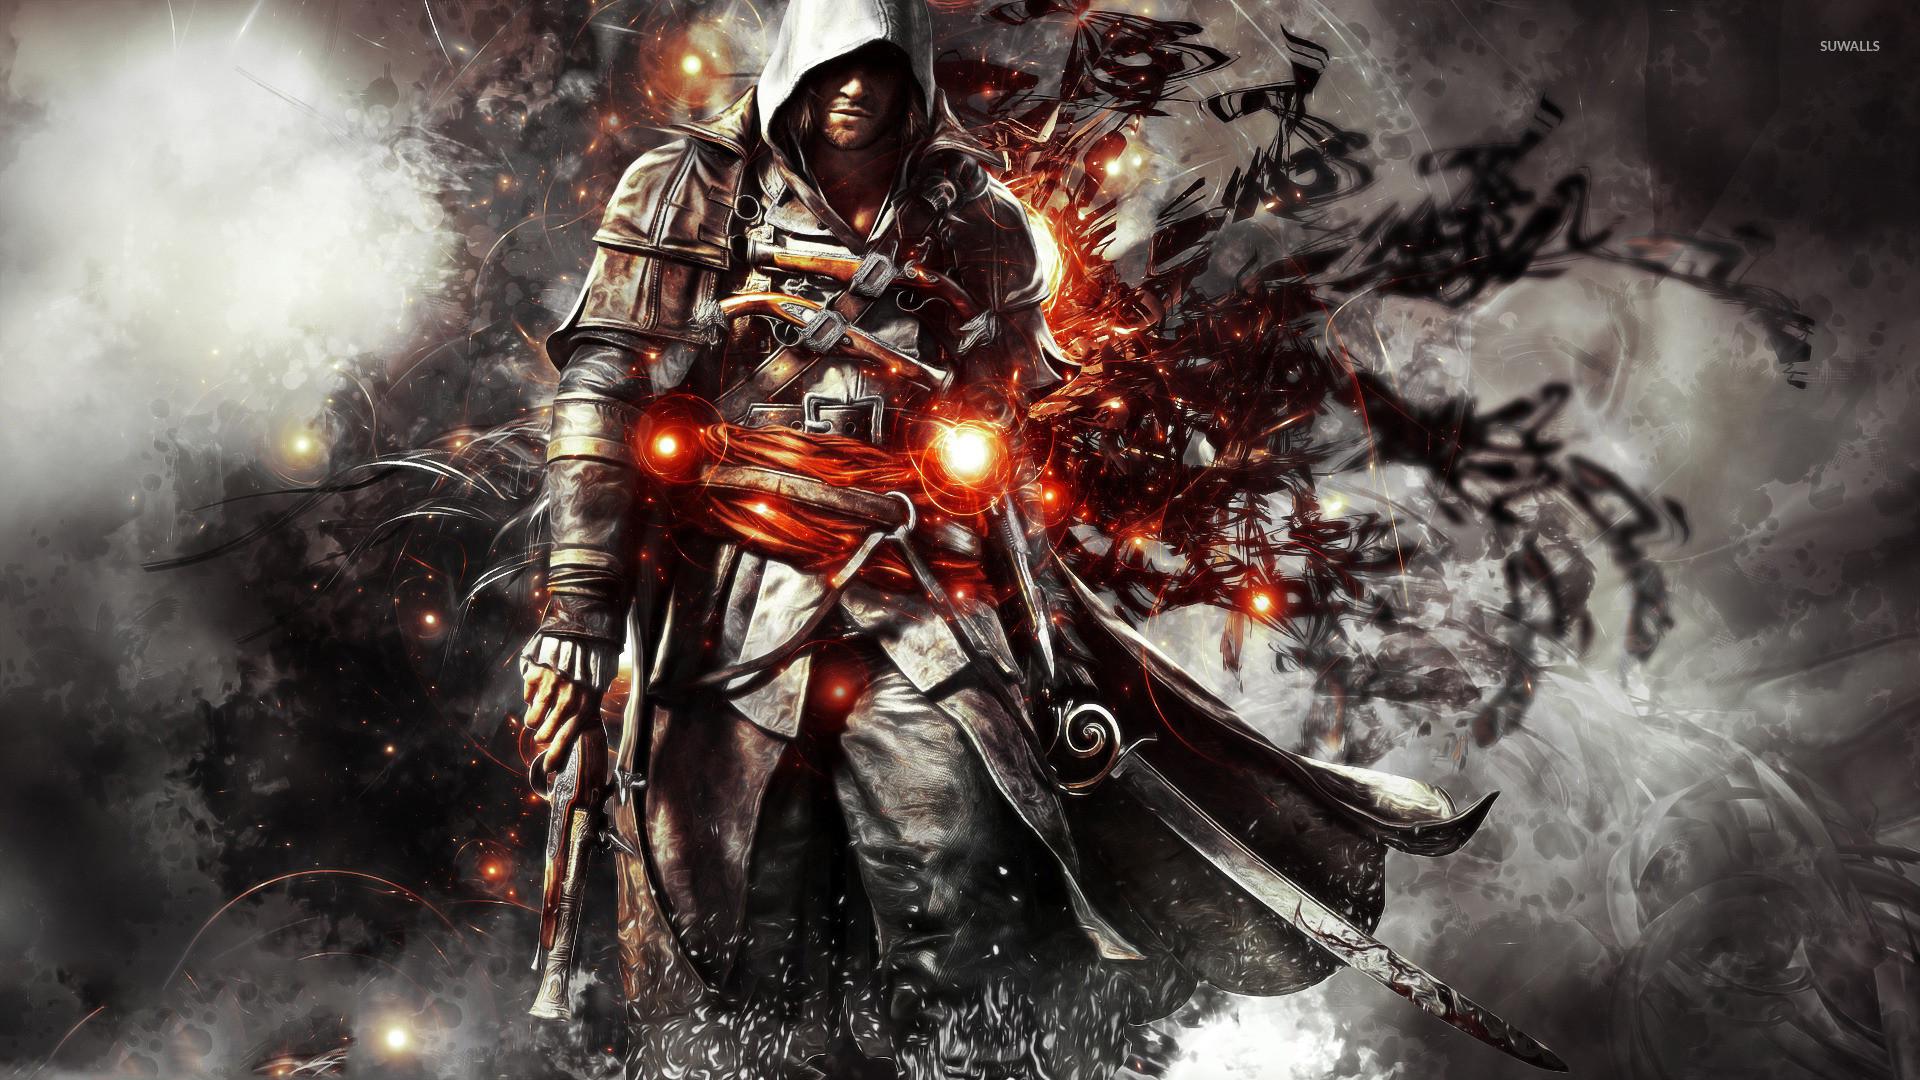 Edward Kenway – Assassin's Creed IV: Black Flag wallpaper jpg